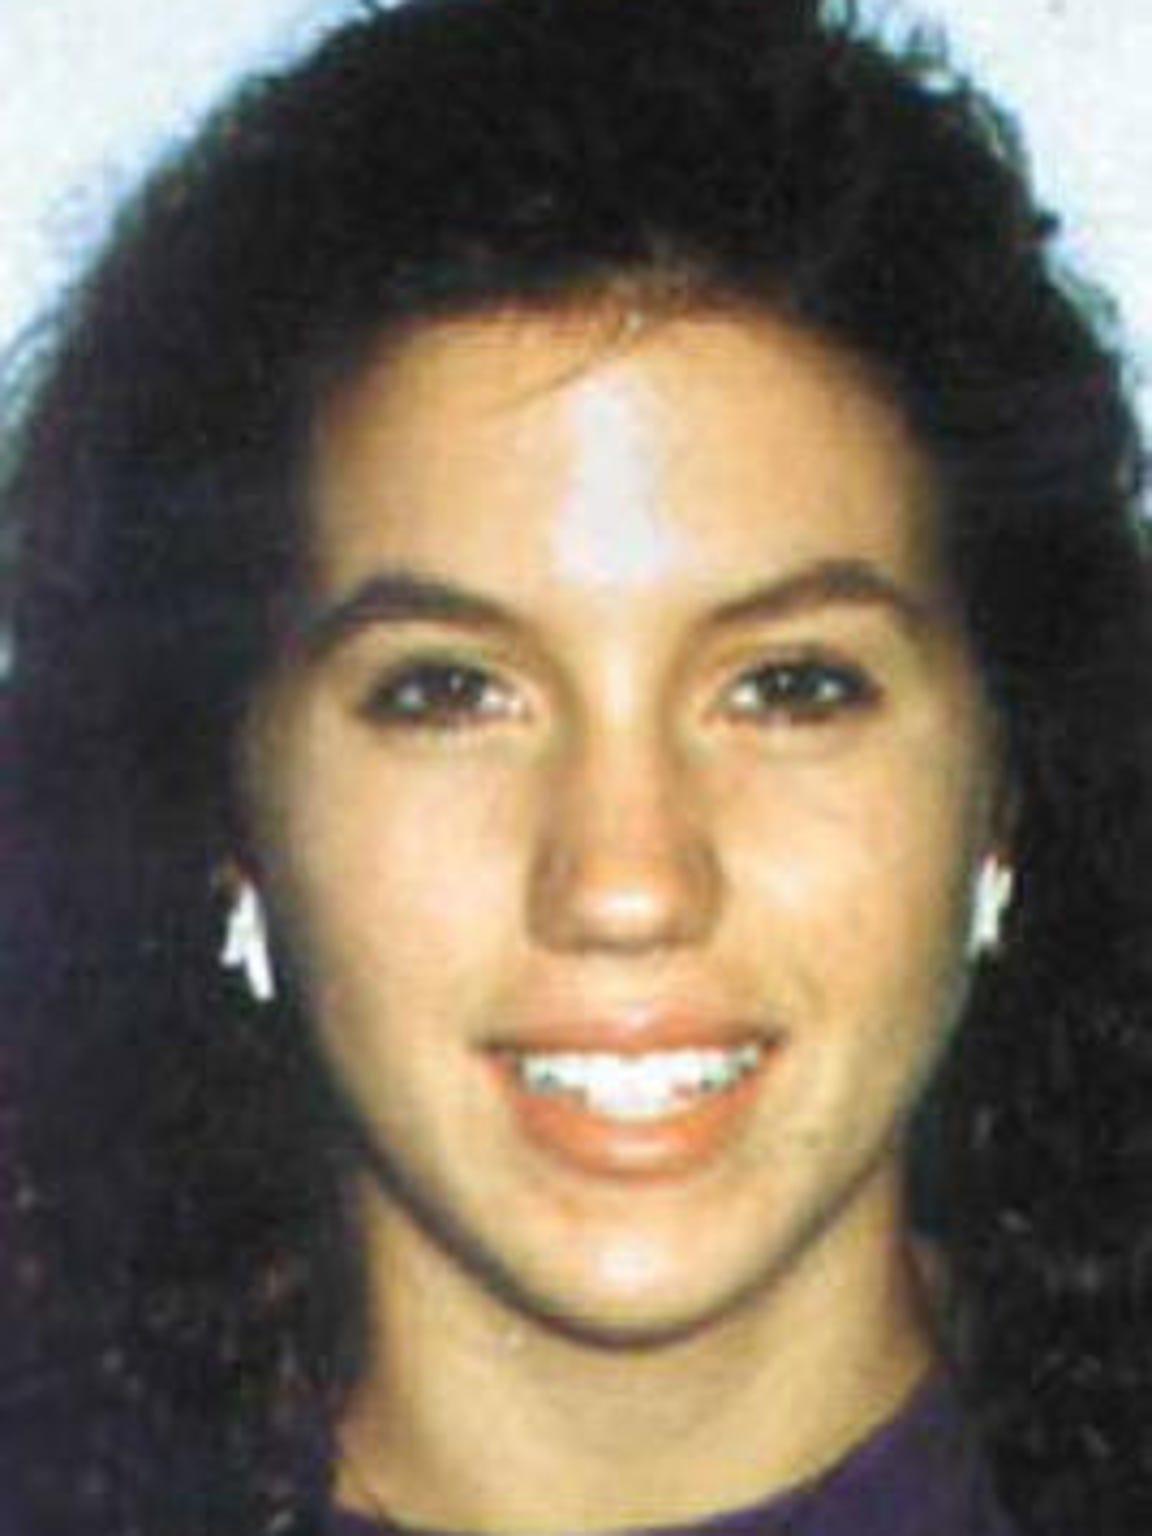 Karen Styles was 22 when she was murdered in October